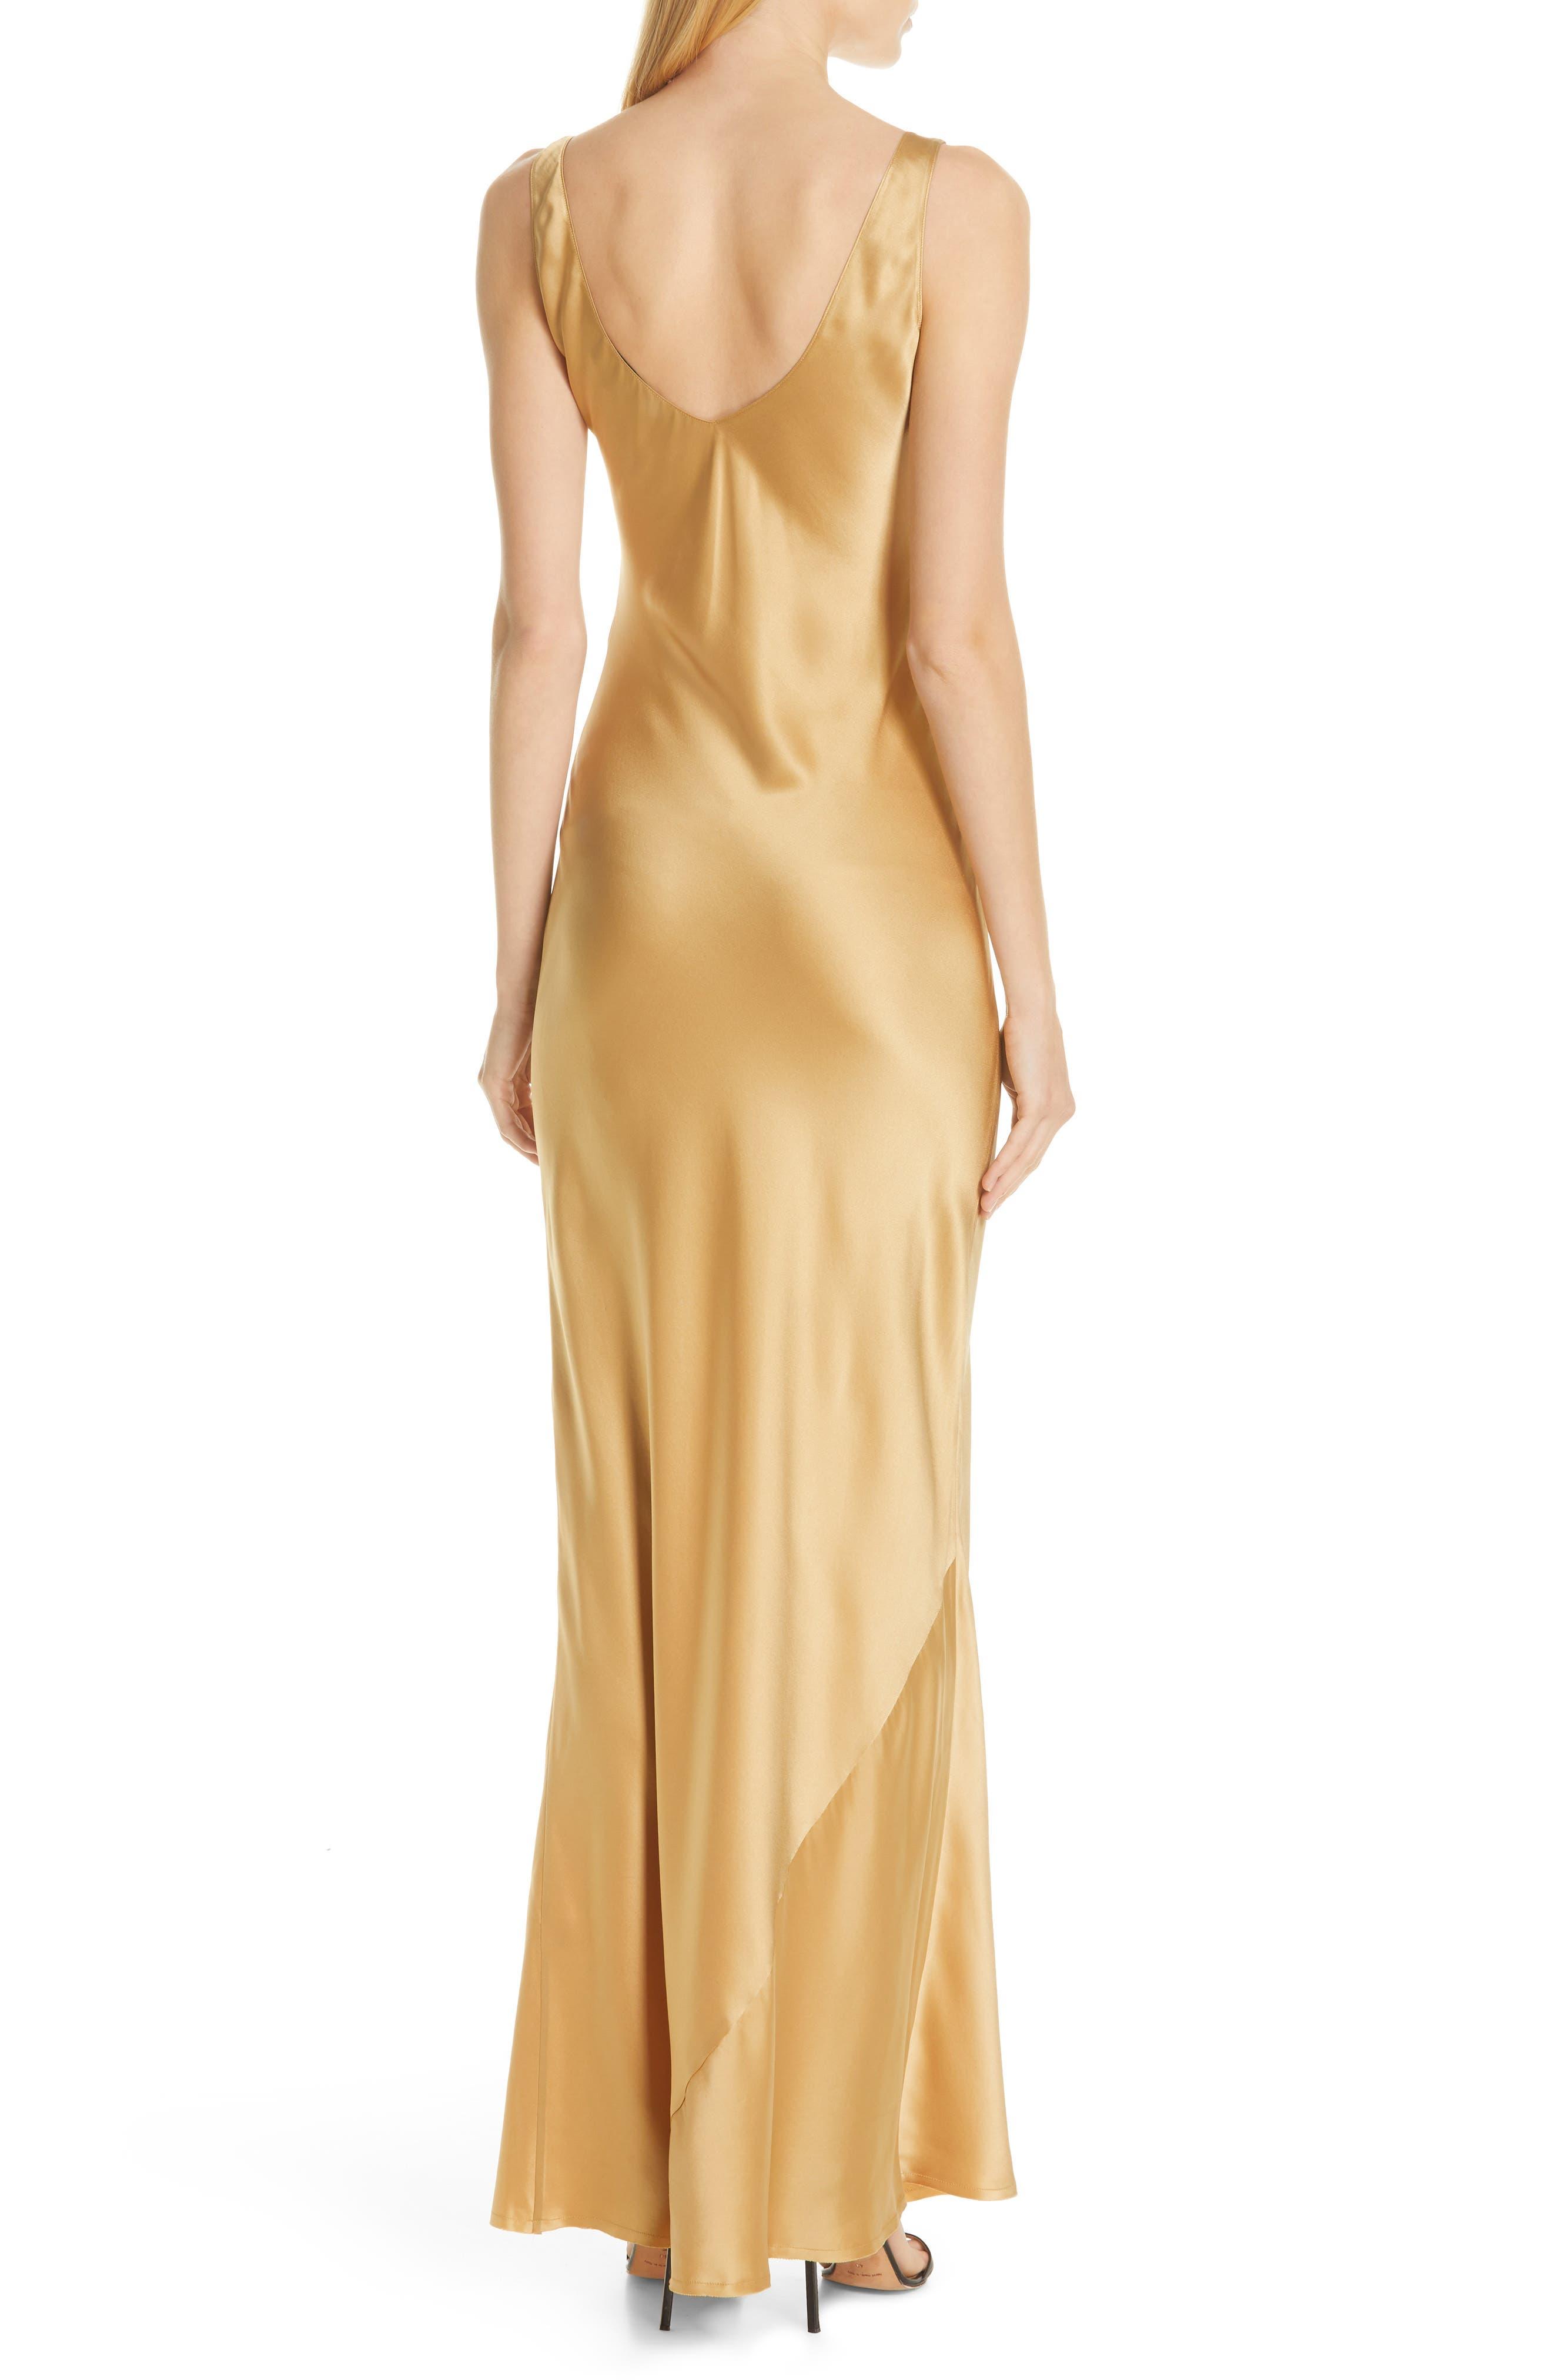 NILI LOTAN, Bazile Silk Evening Dress, Alternate thumbnail 2, color, GOLDEN